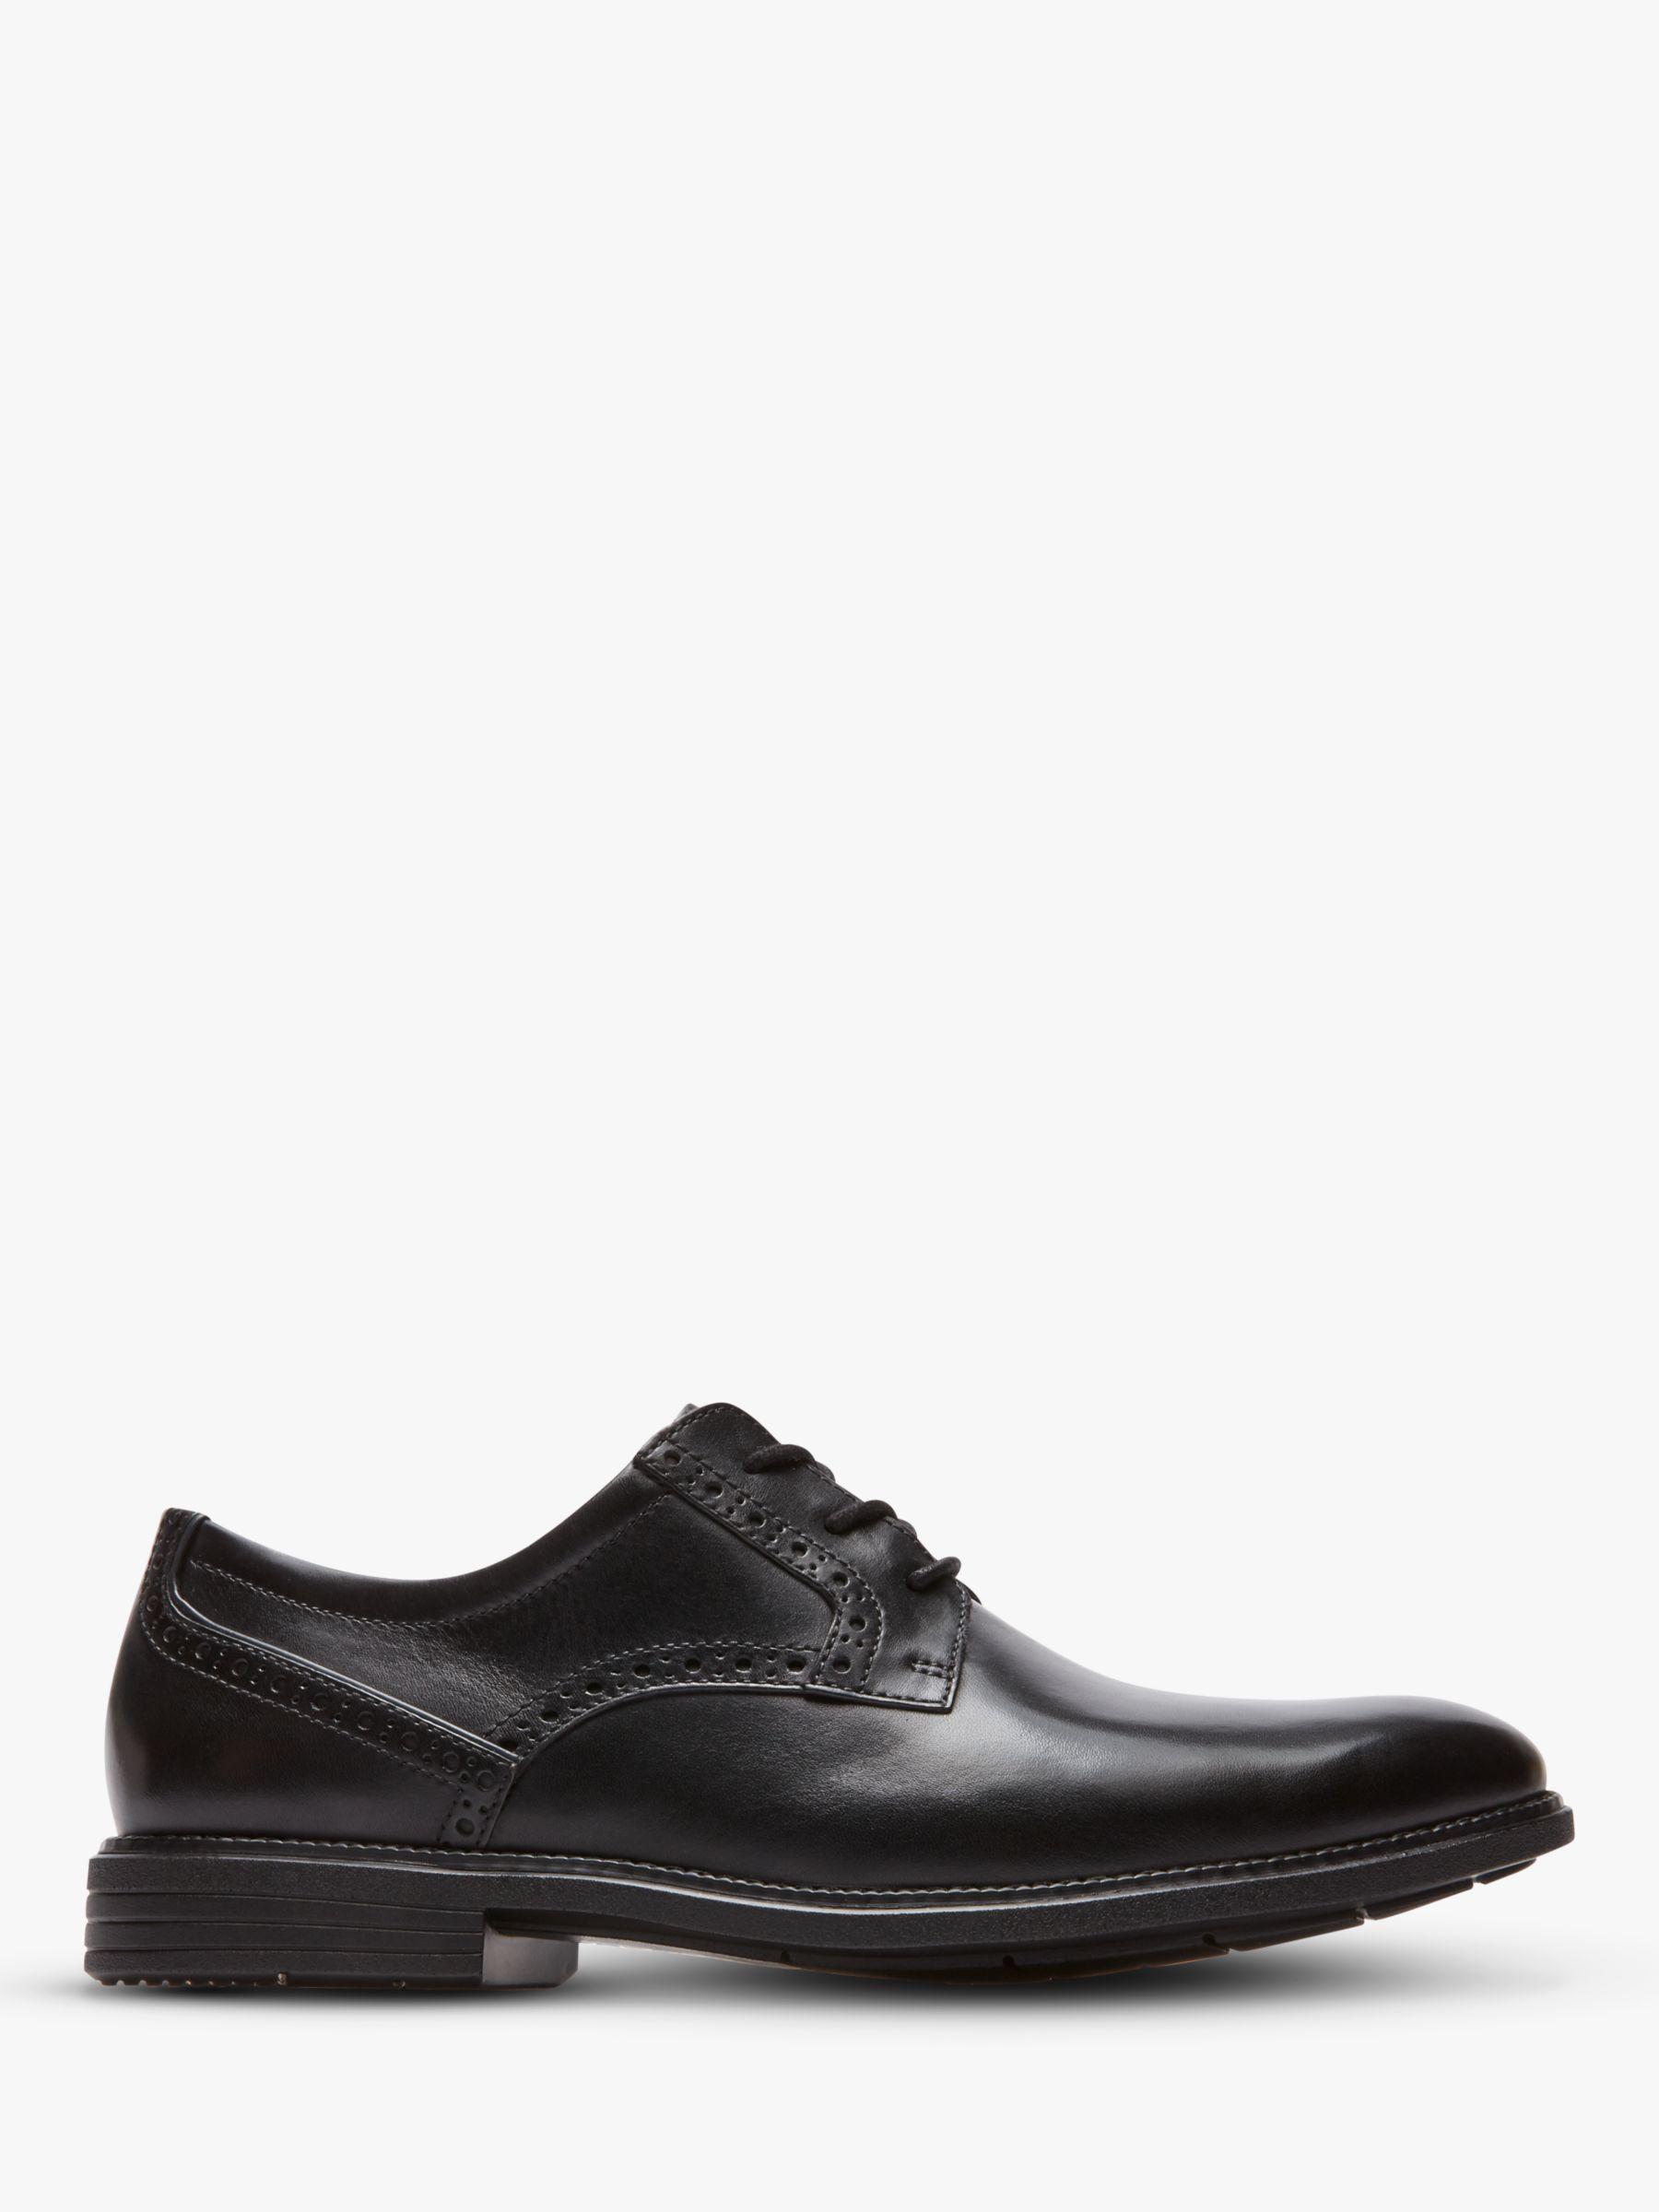 Rockport Rockport Madson Derby Leather Shoes